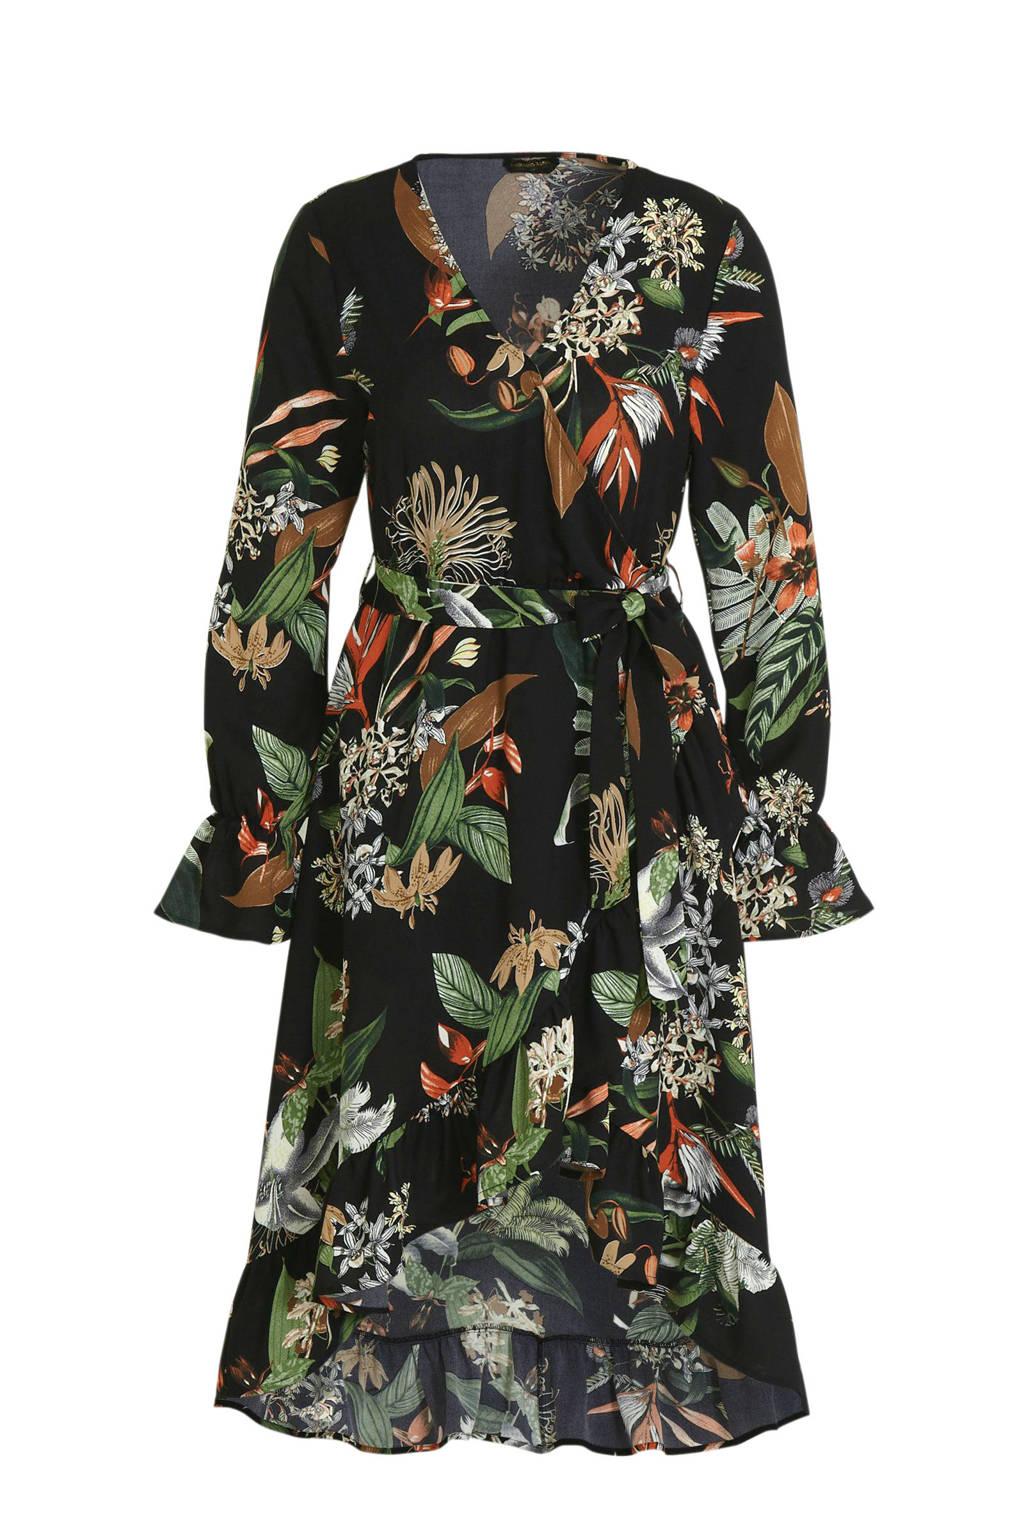 Colourful Rebel gebloemde jurk River Tropical zwart, Zwart